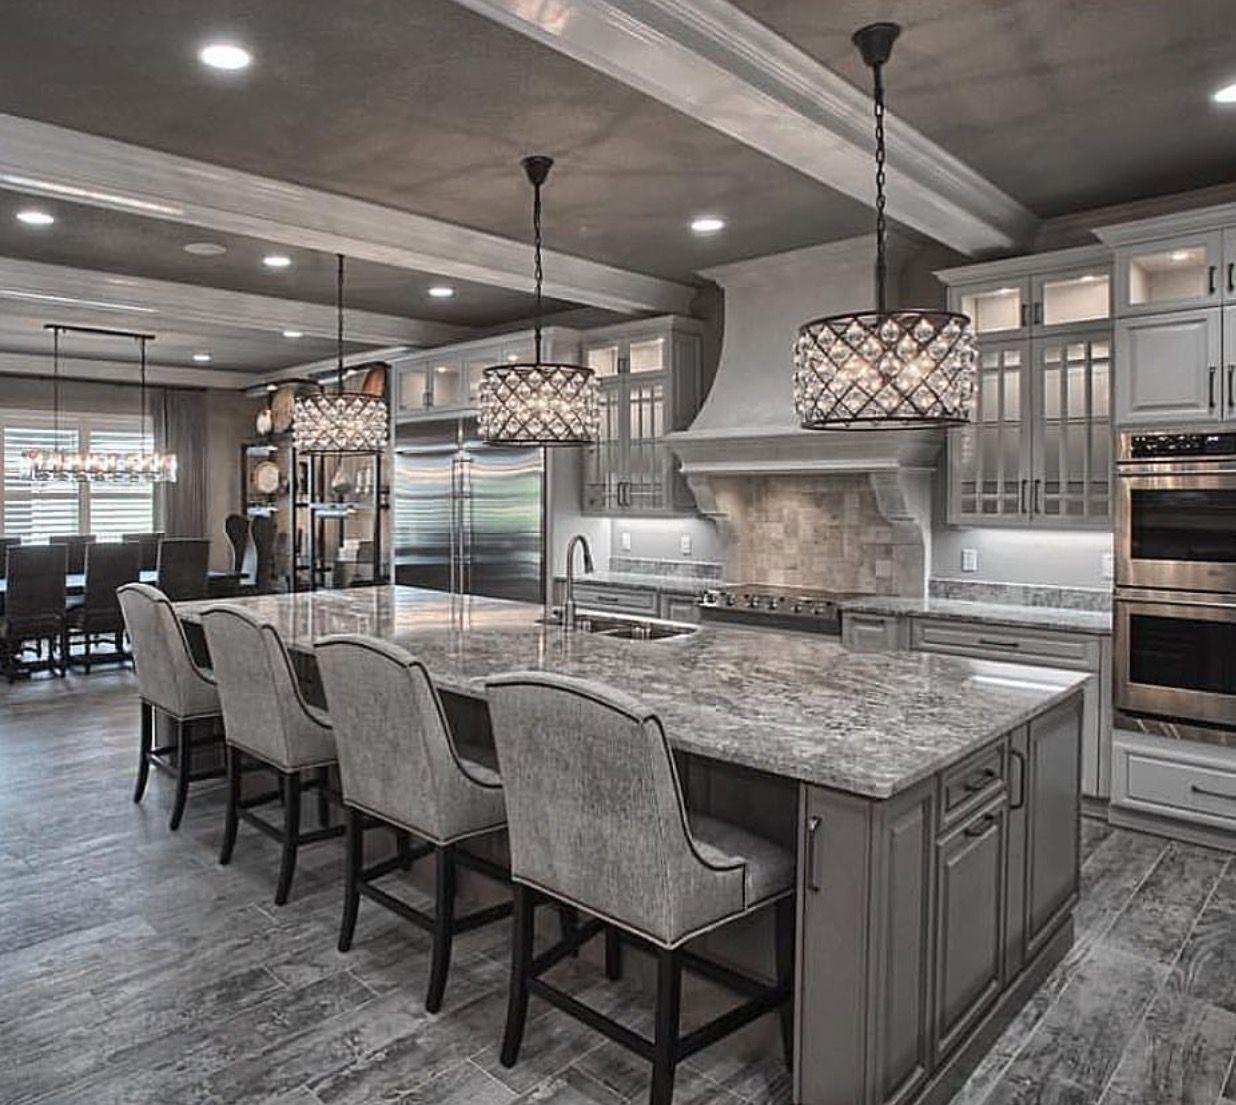 Dachboden über küchenideen top  metal barndominium floor plans for your home  home